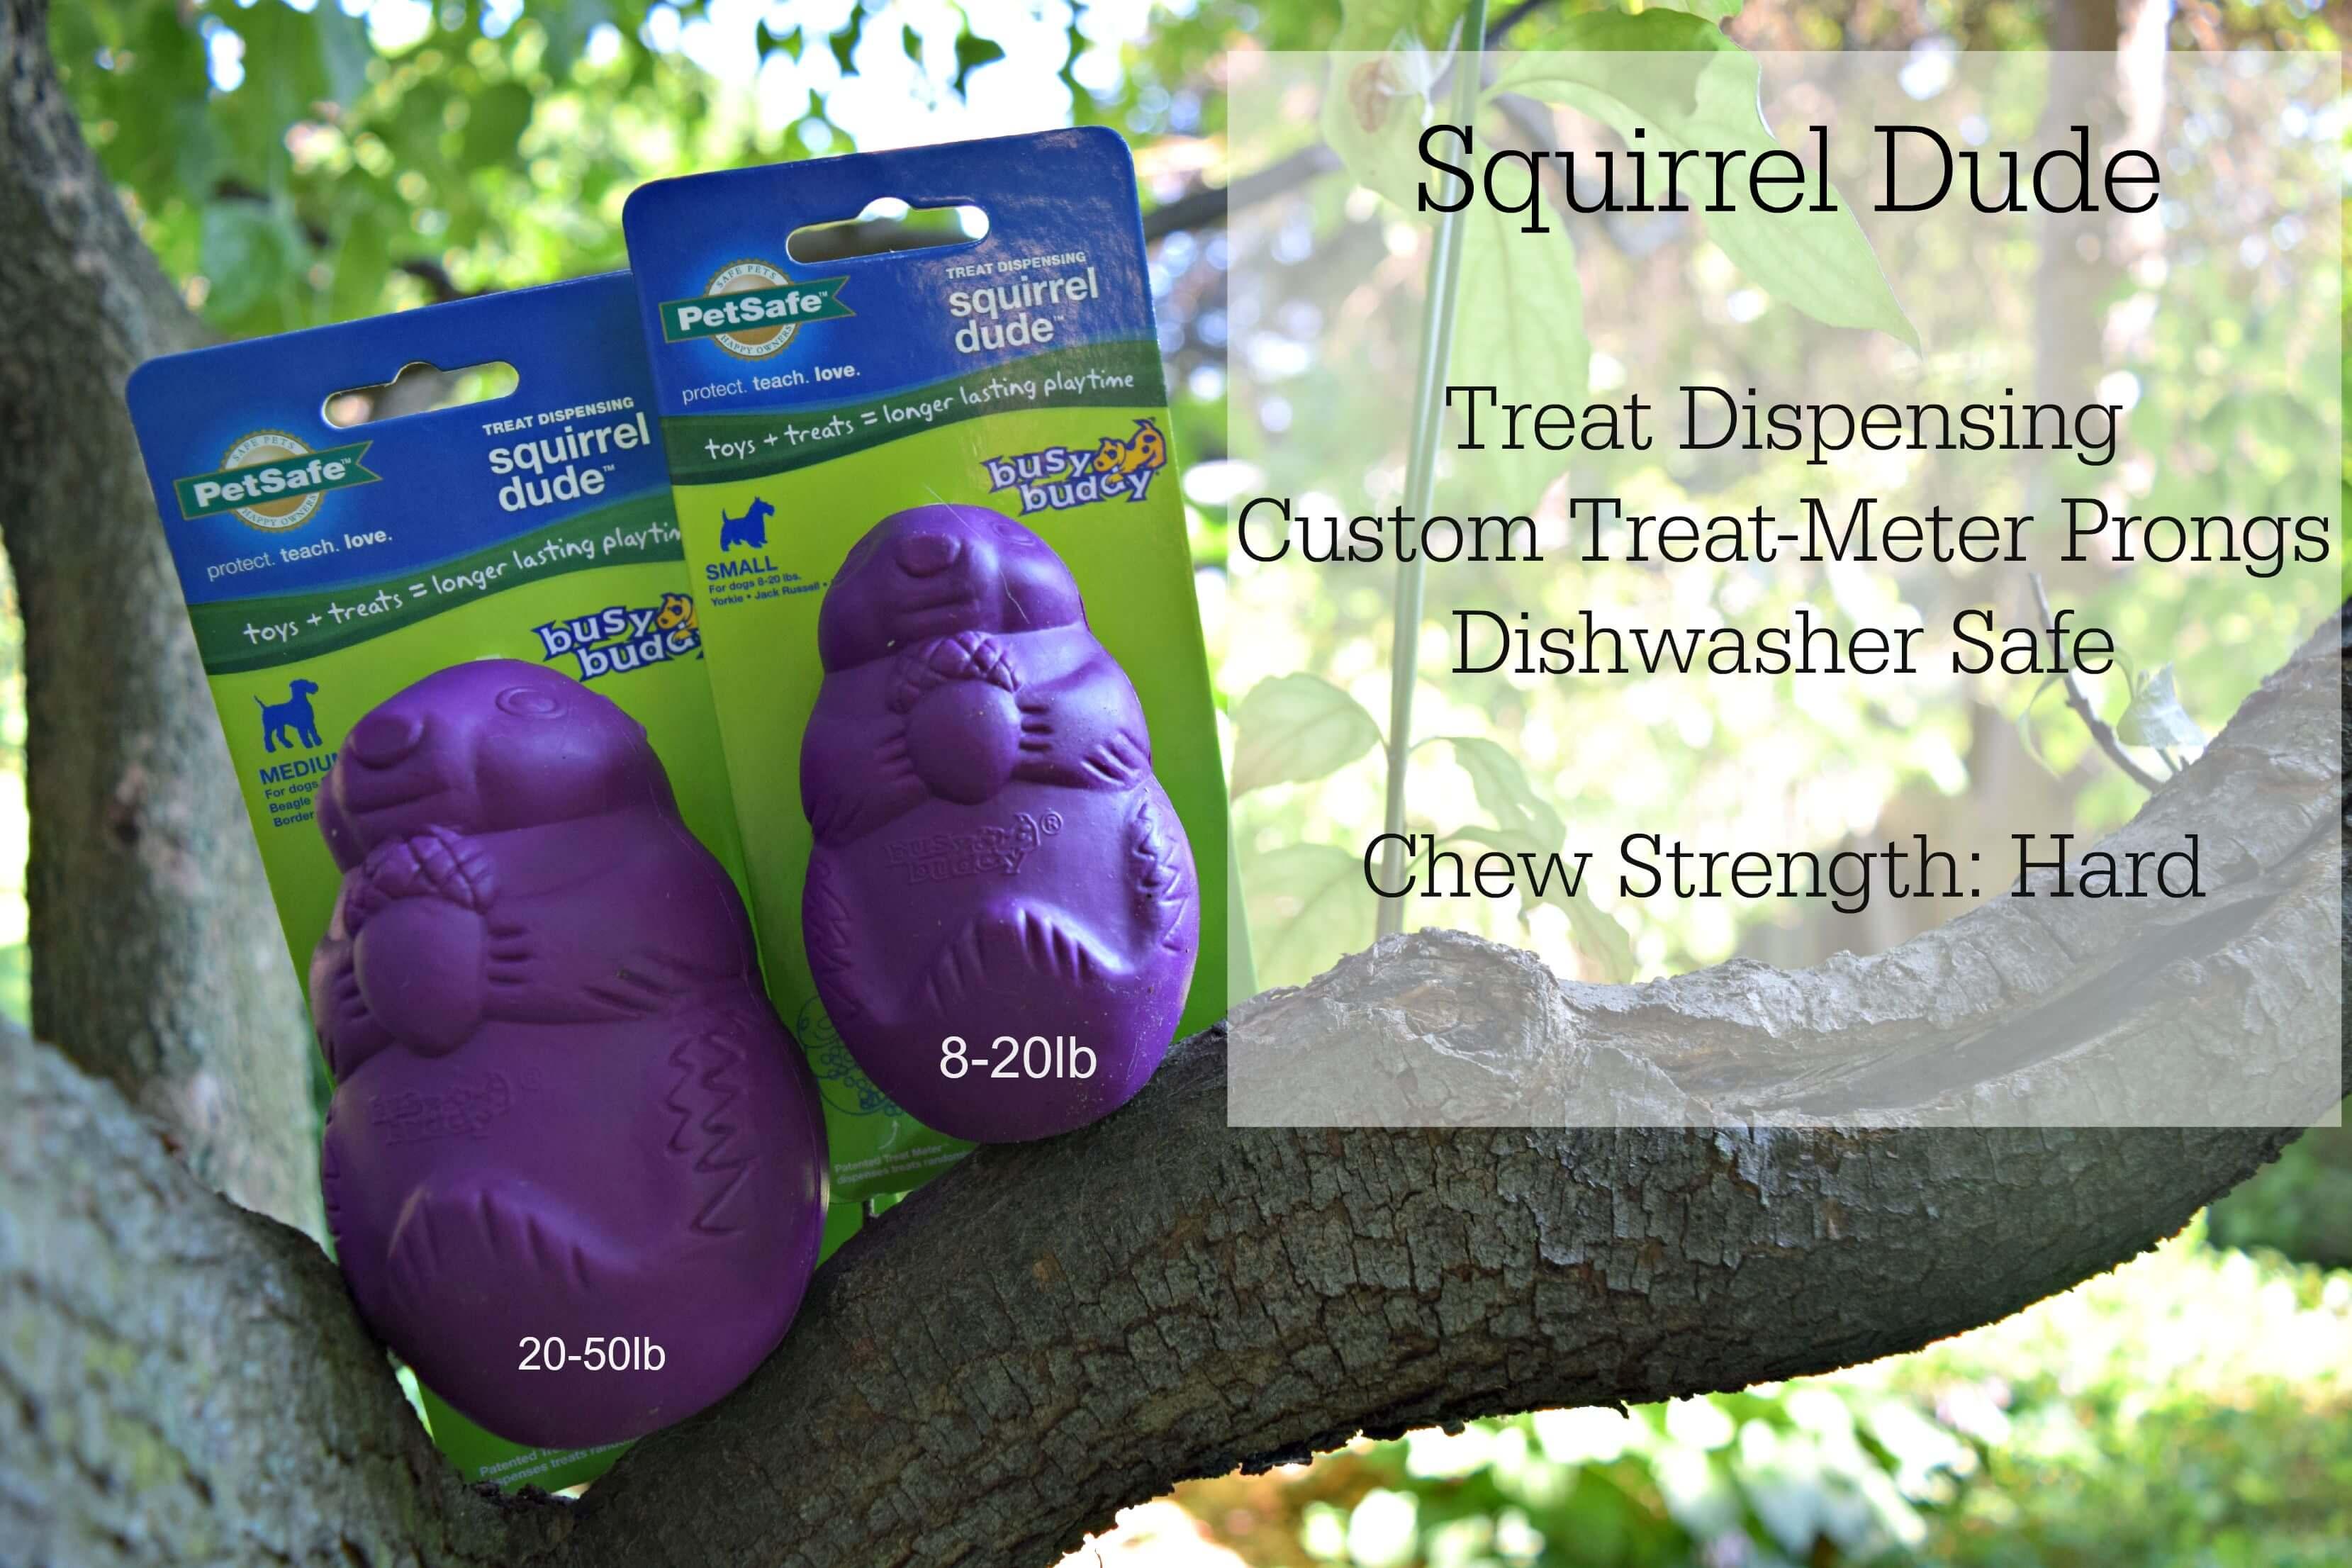 Squirrel Dude